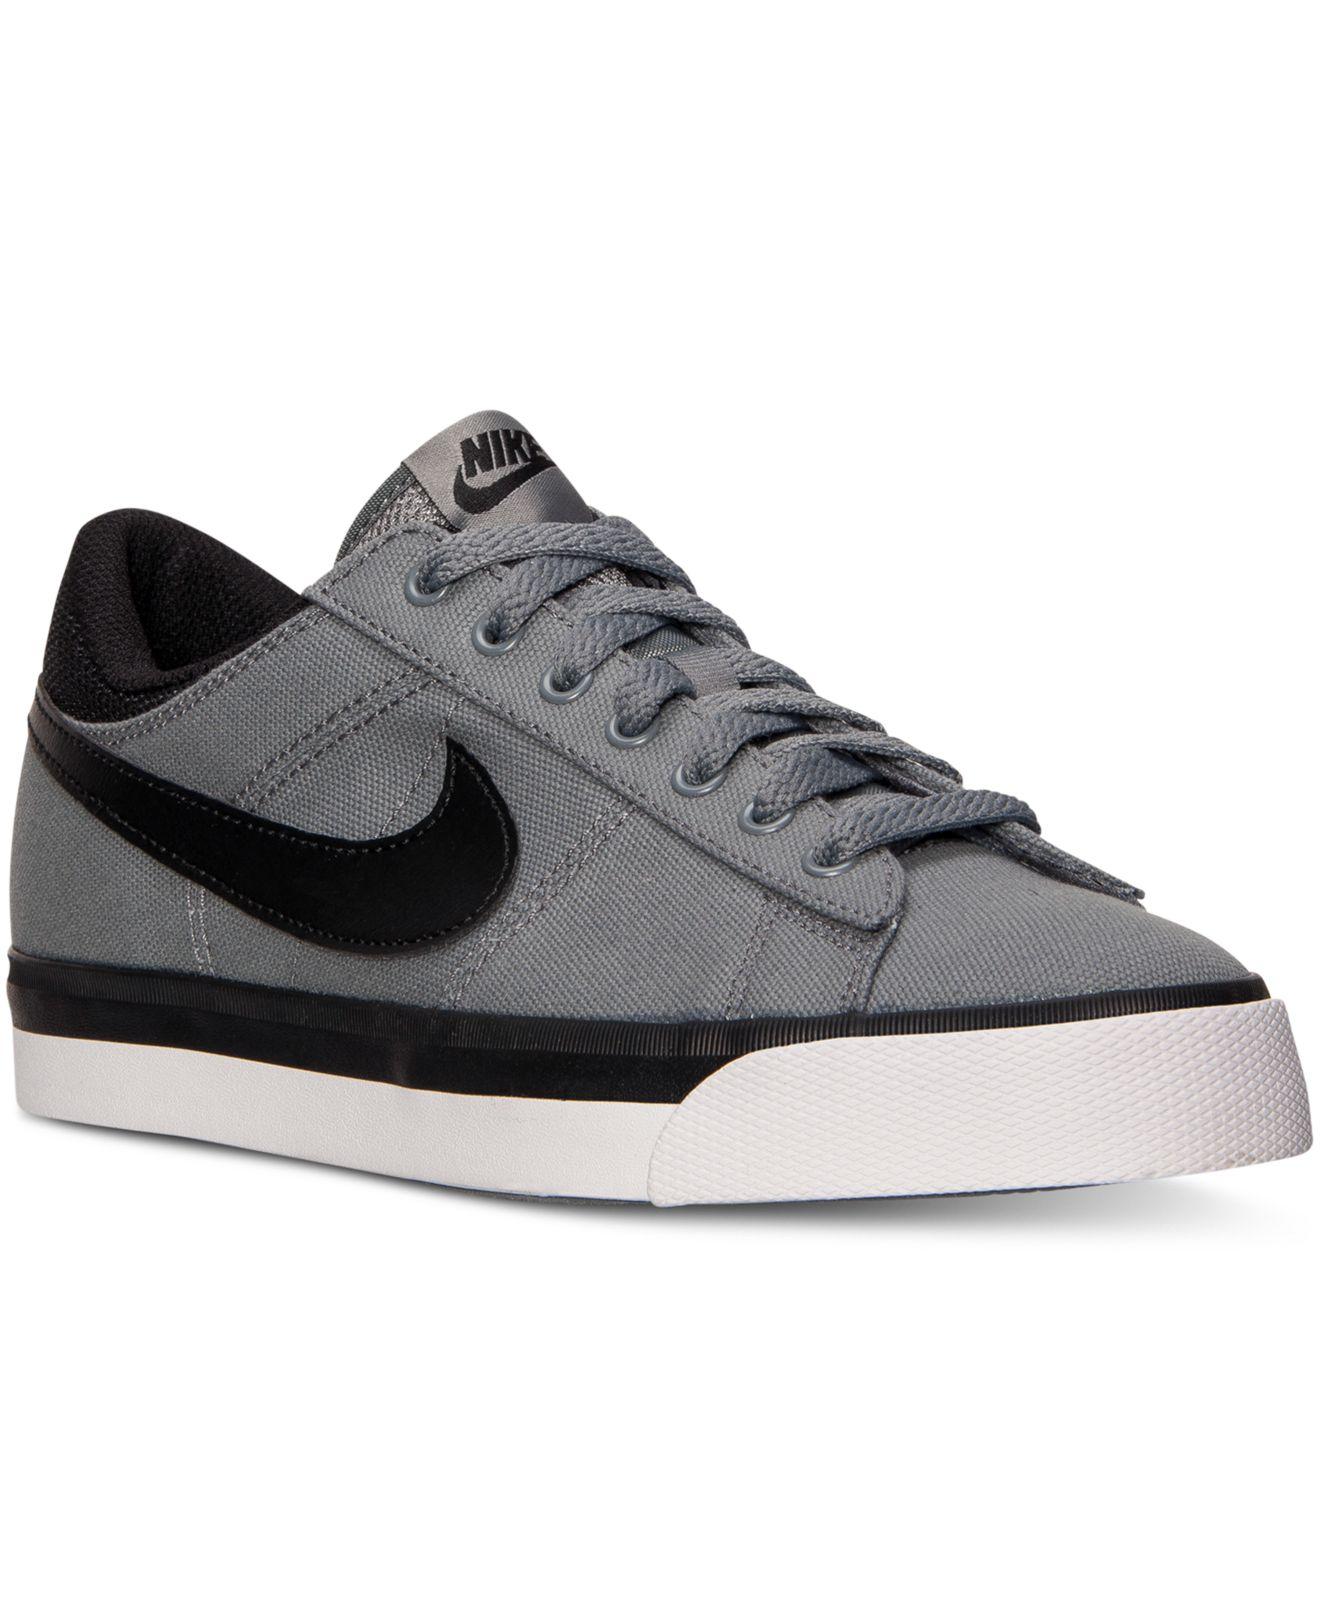 Lyst - Nike Men's Match Supreme Hi Textile Casual Sneakers ...